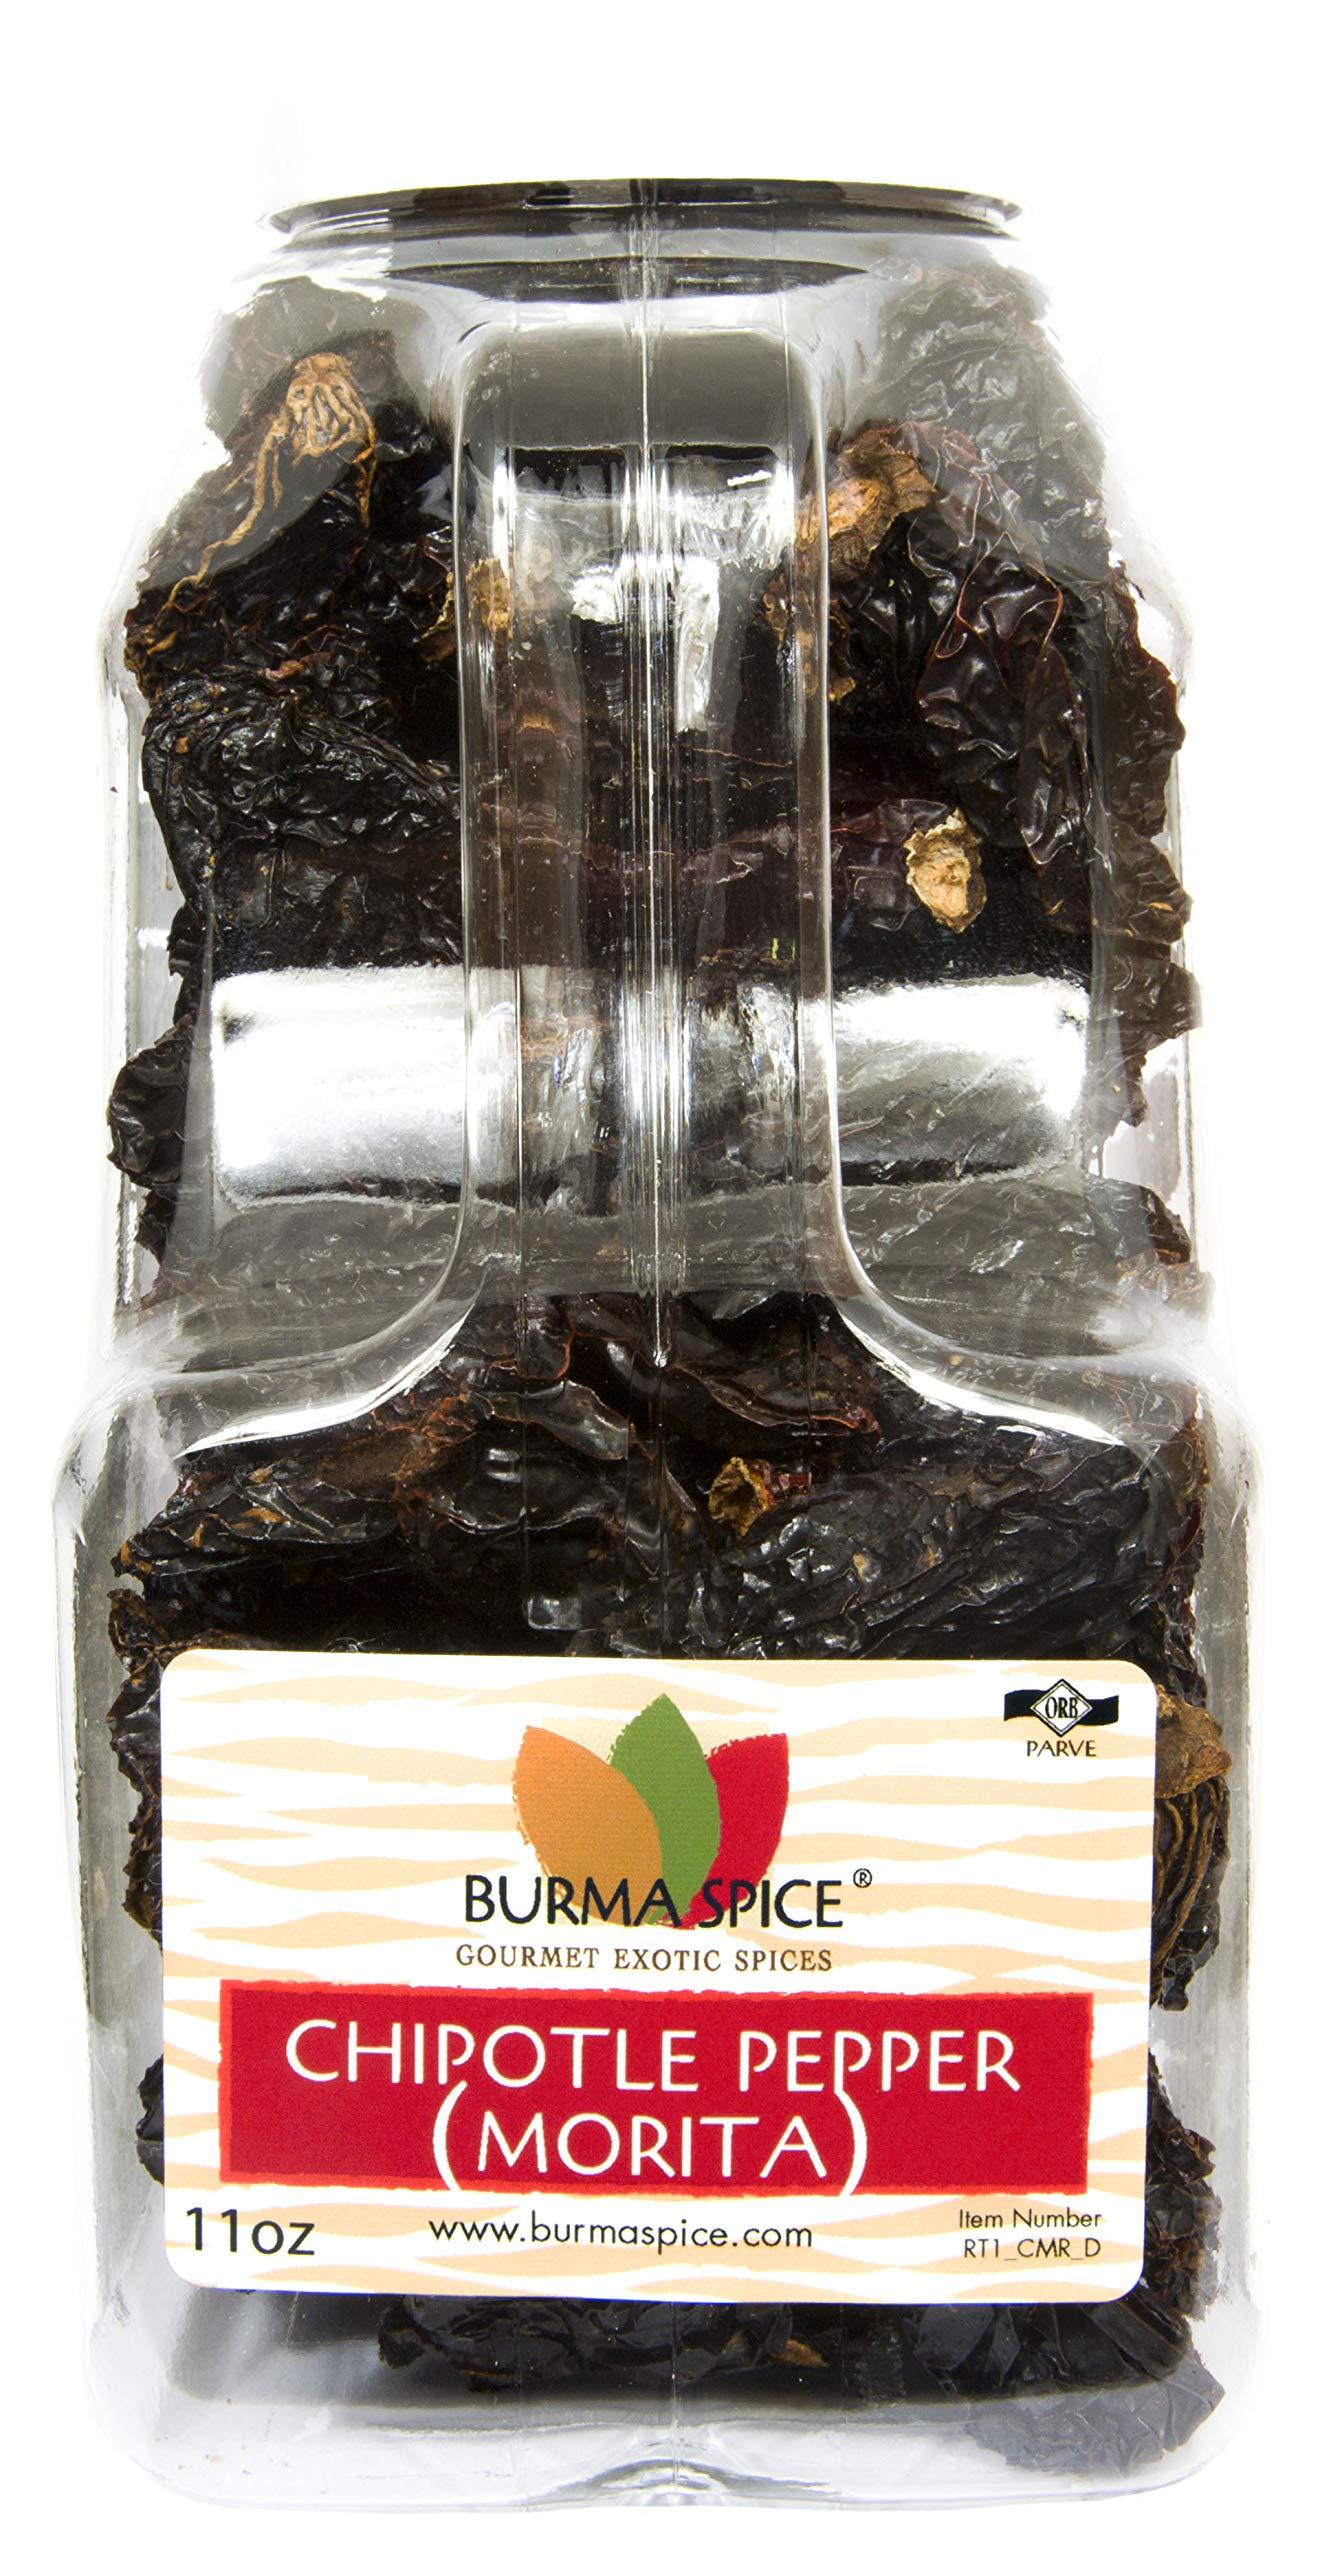 Dried Morita Chipotle Pepper (11oz.) by Burma Spice (Image #1)